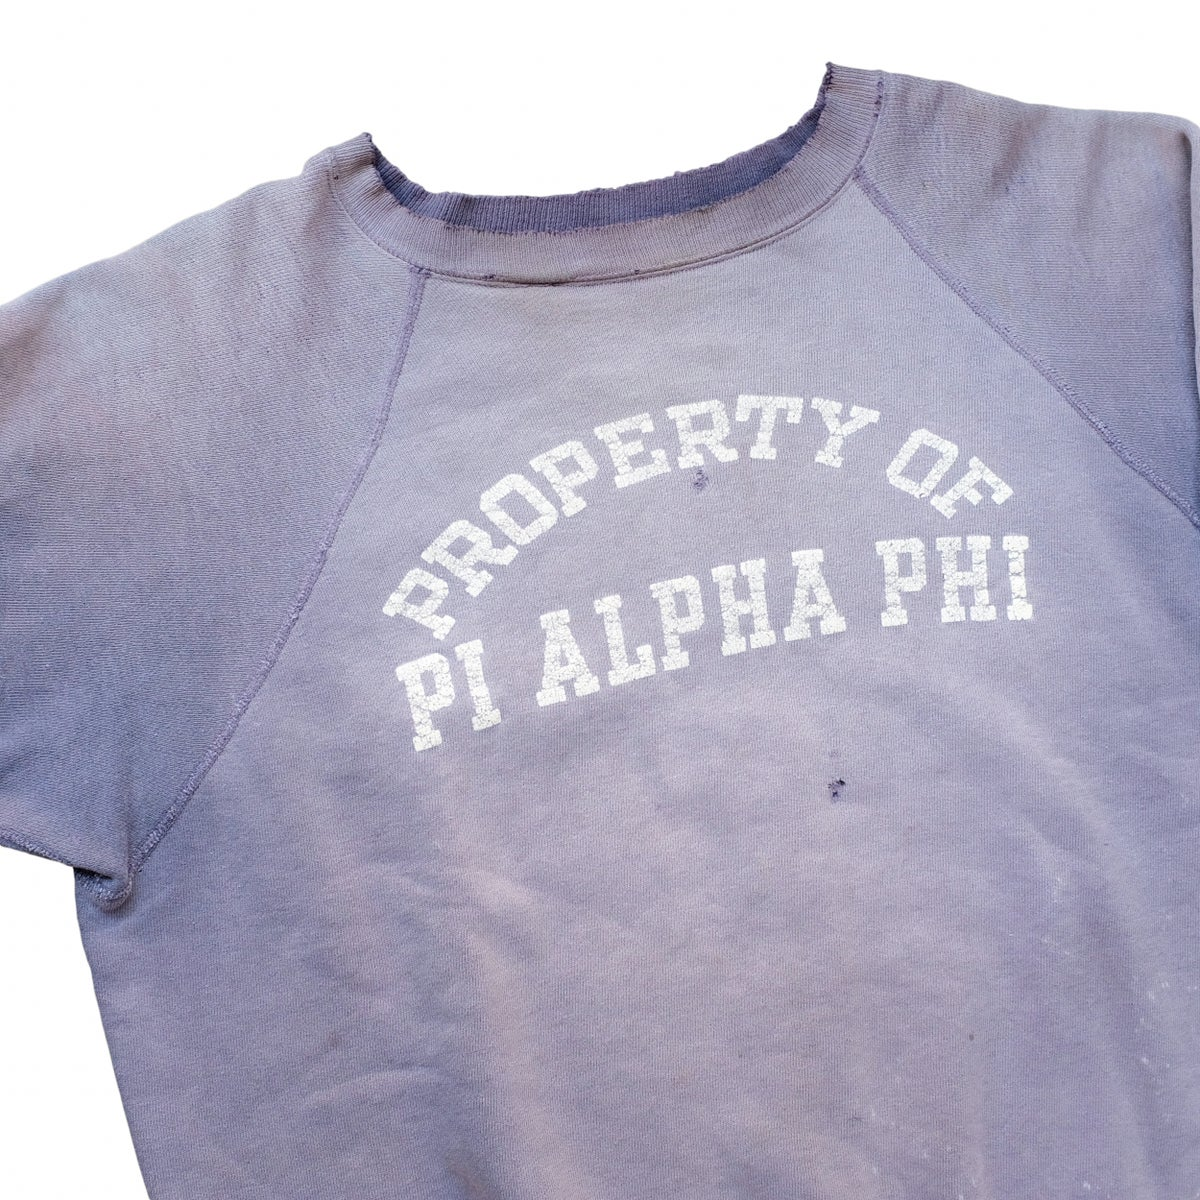 Image of Vintage 50s/60s Sunfaded Fraternity Sweatshirt